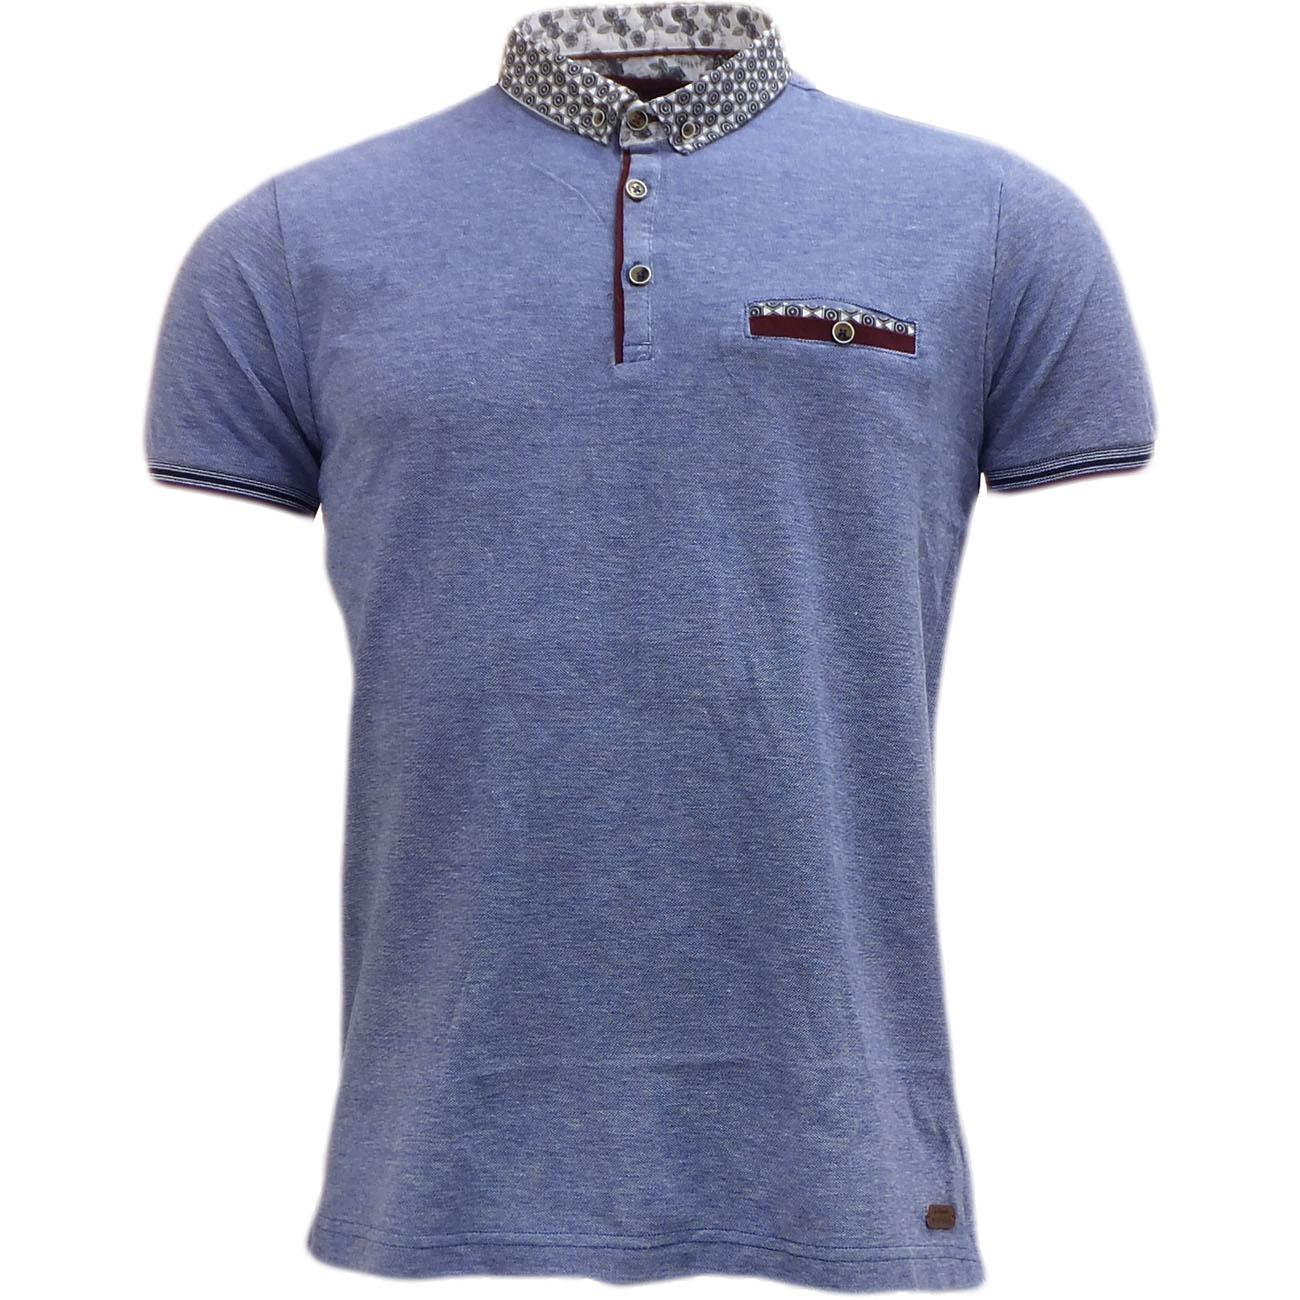 Brave soul polo shirt mens polos short sleeve shirts for Mens branded polo shirts